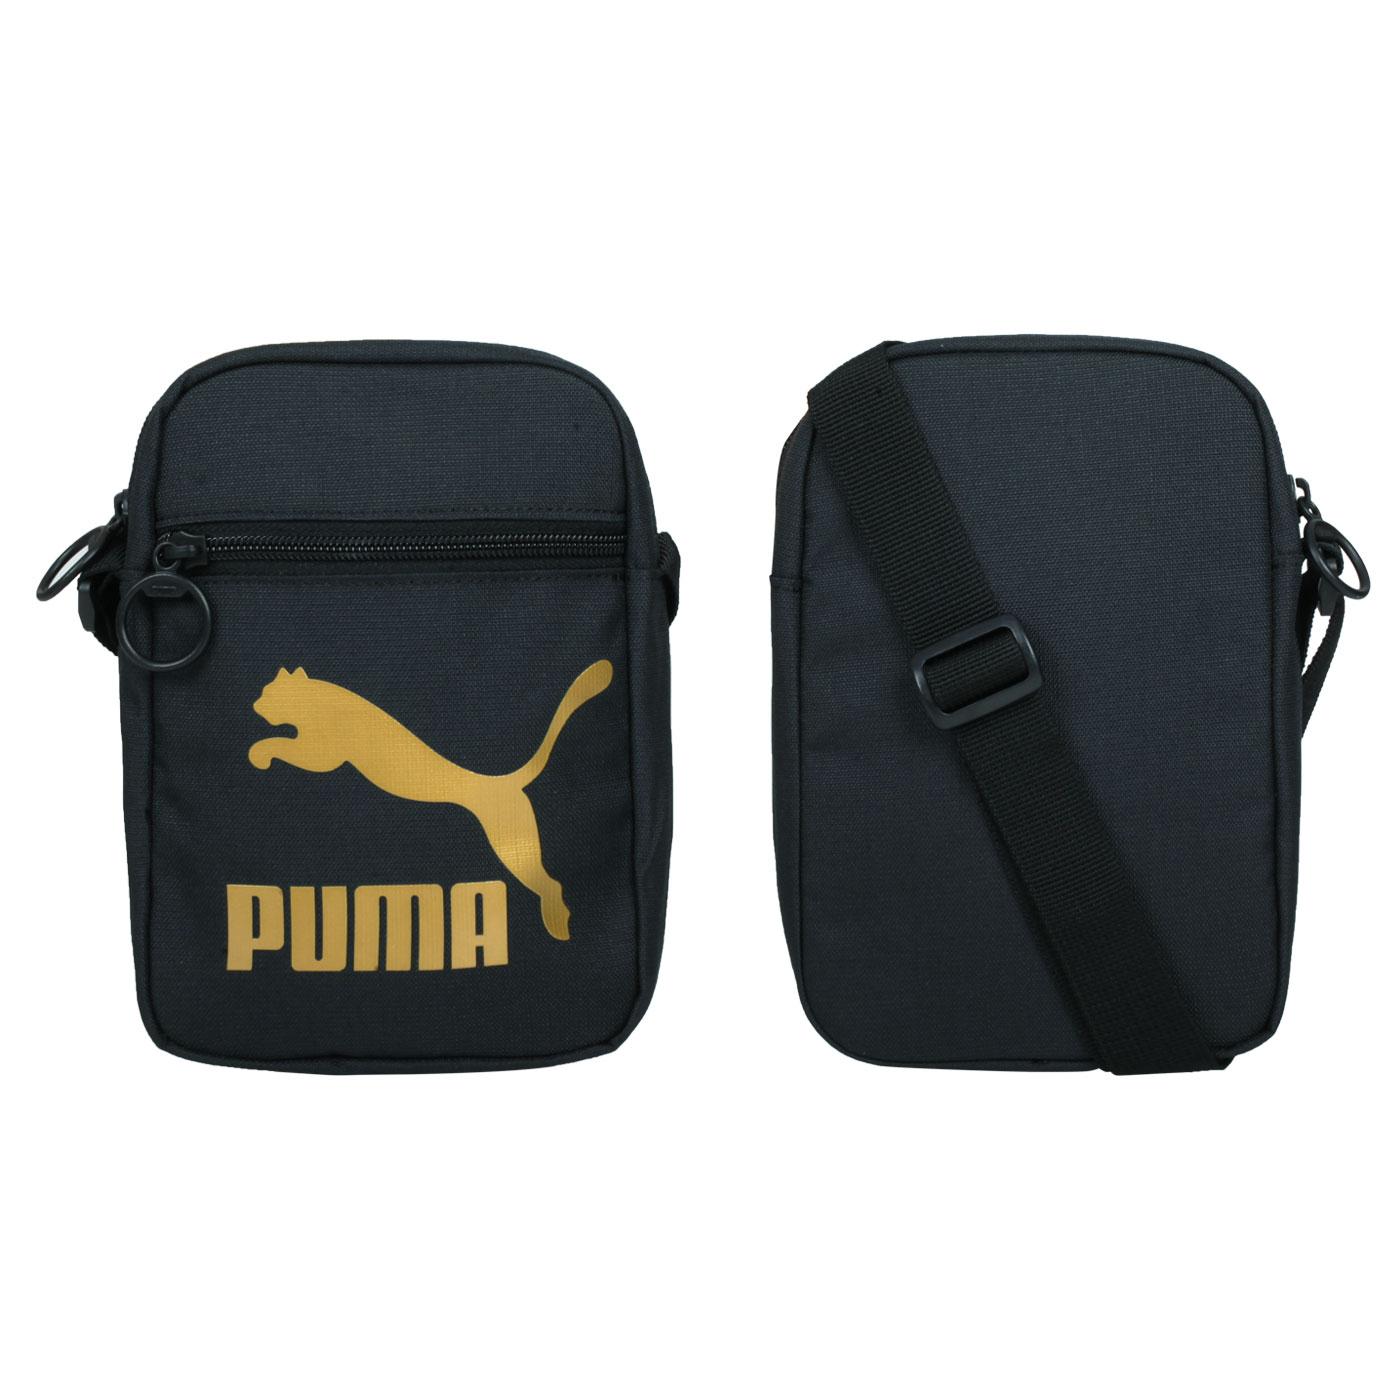 PUMA 小側背包 07800801 - 黑金